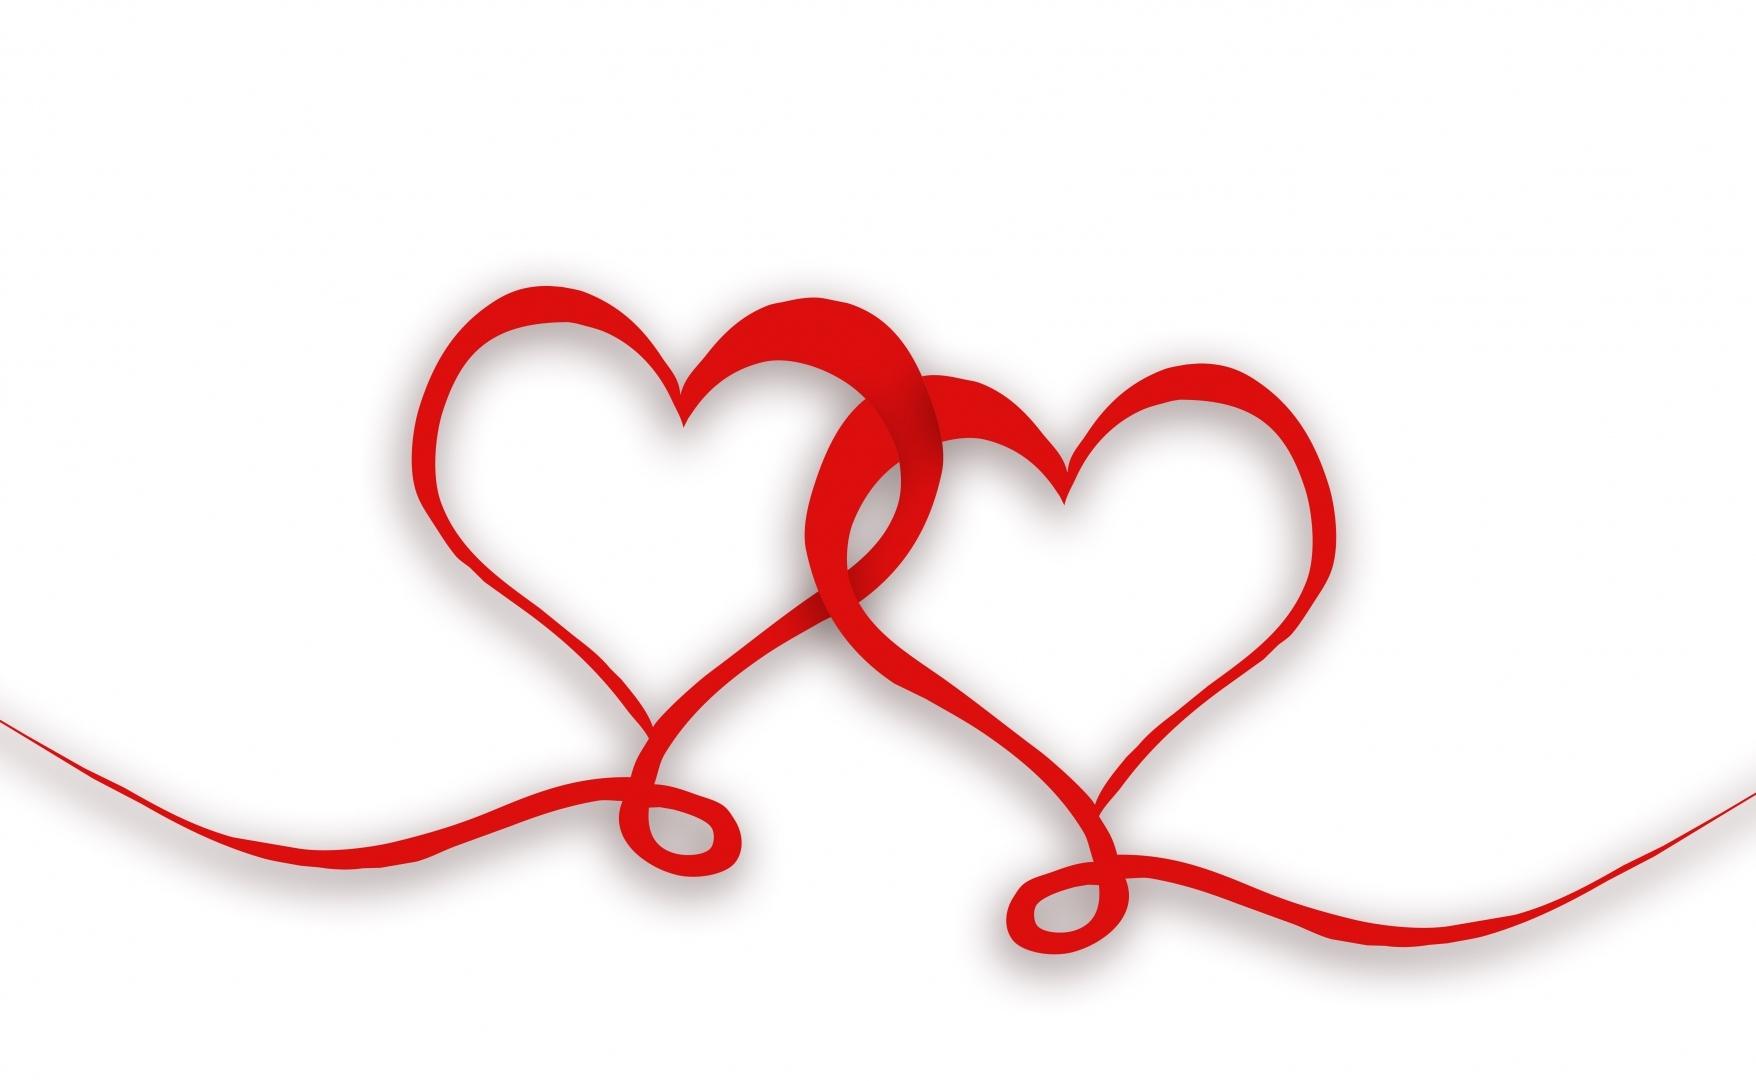 site de rencontre amour site rencontre libertines